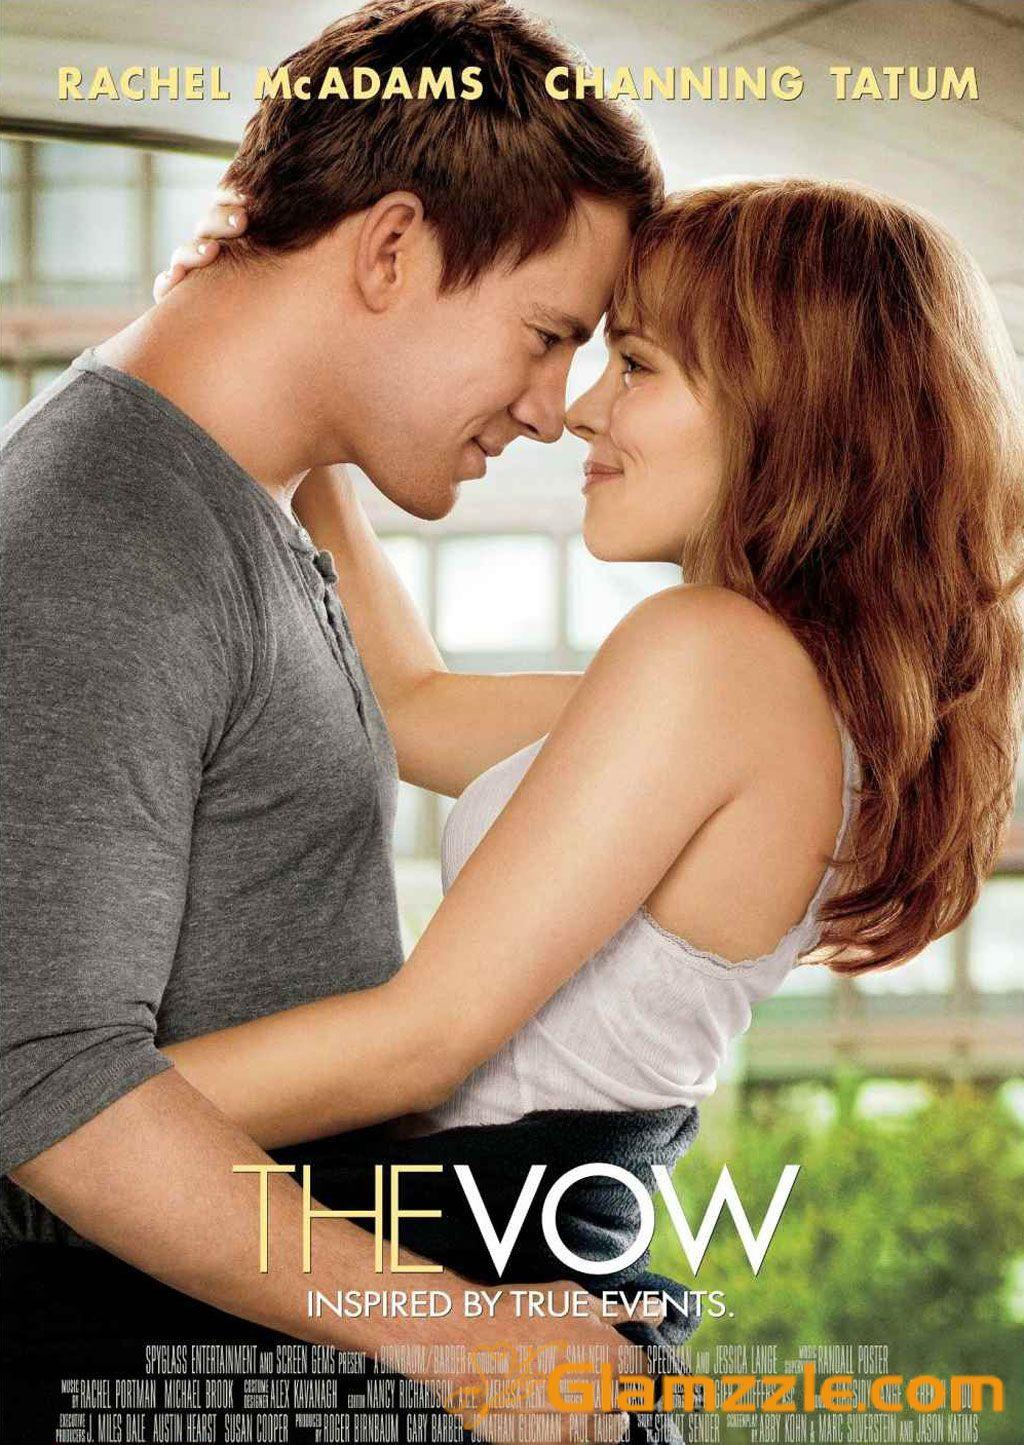 the key 2014 full movie